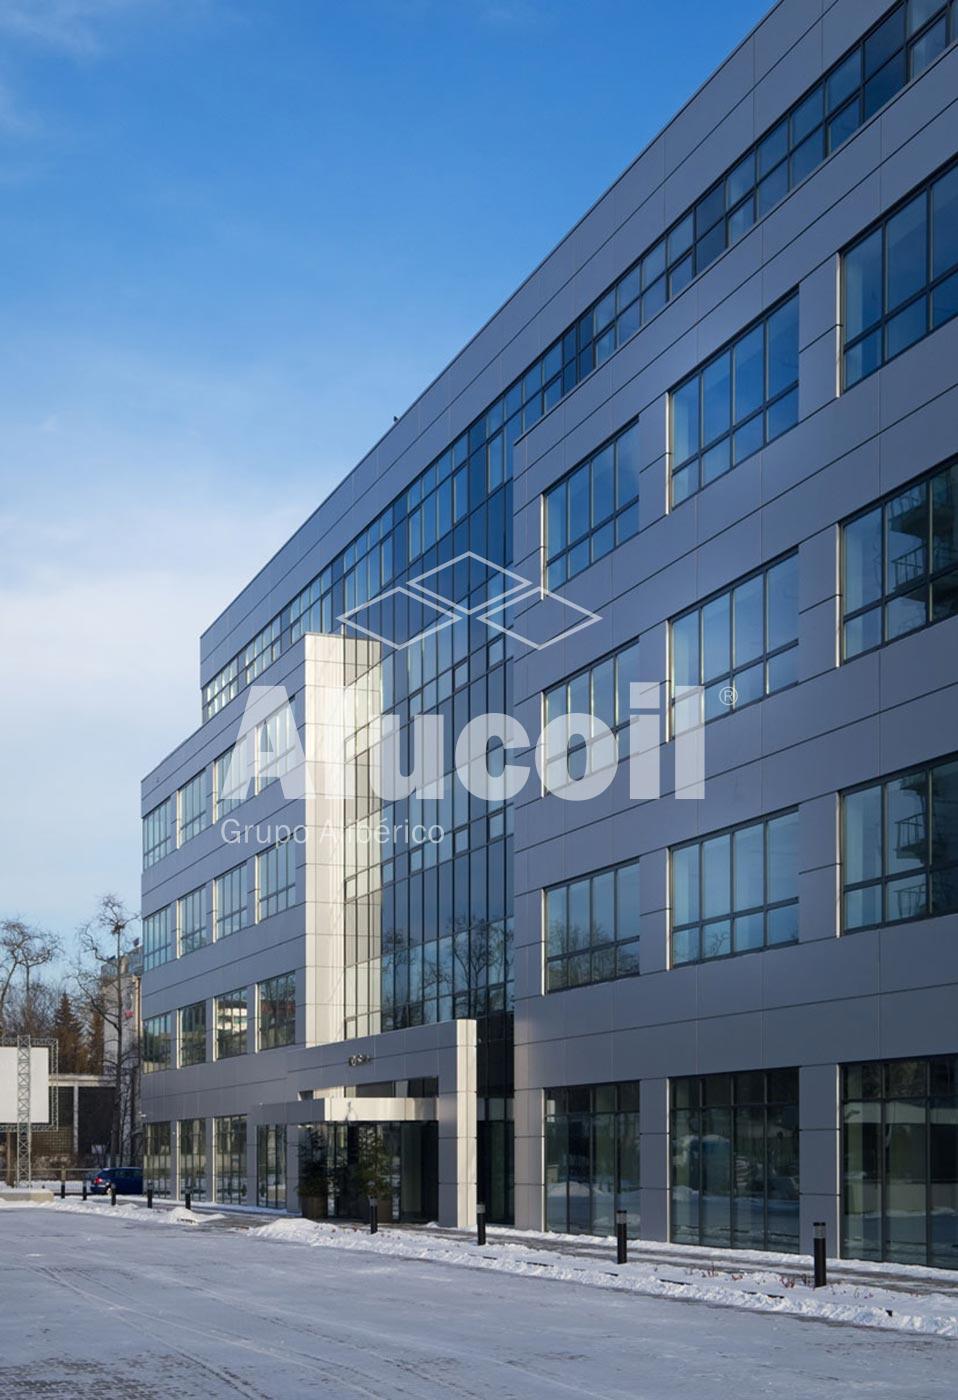 IRIS building